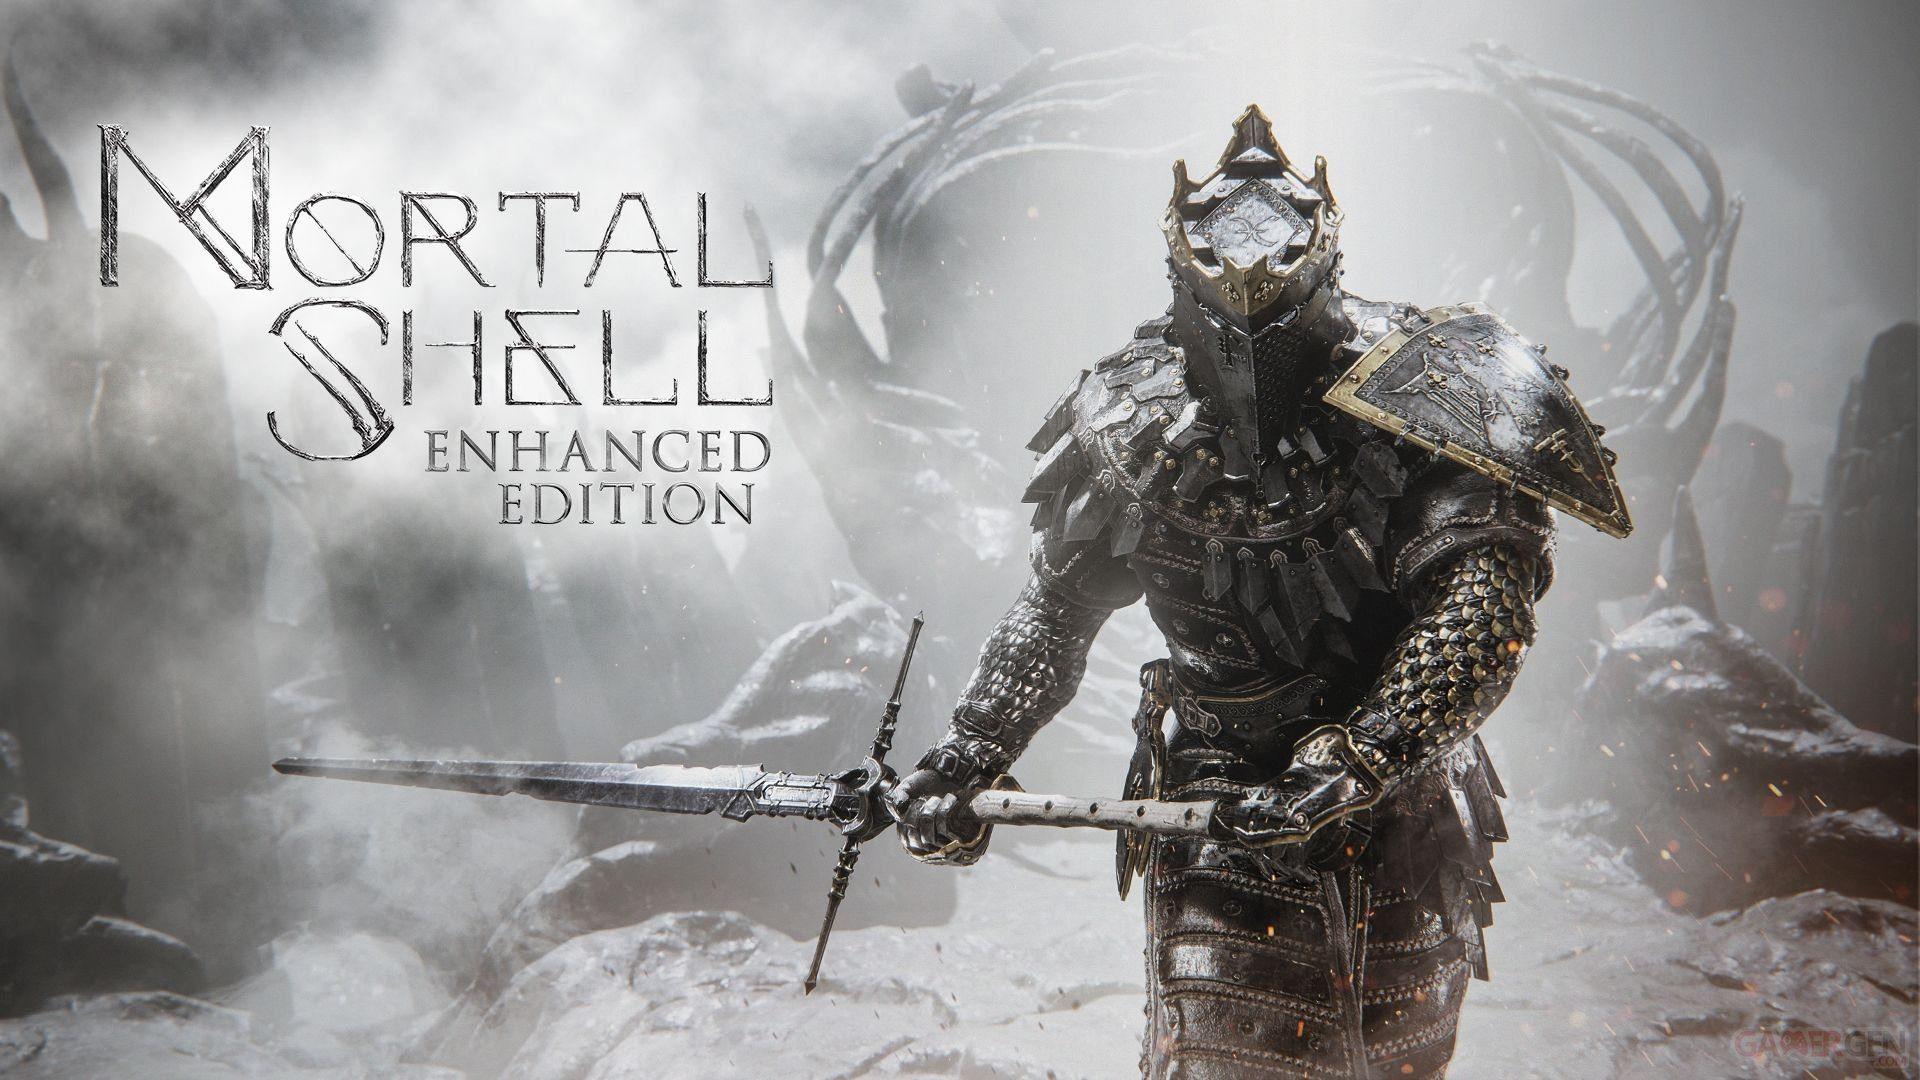 mortal-shell-enhanced-edition-25-02-2021-key-art_0900974846